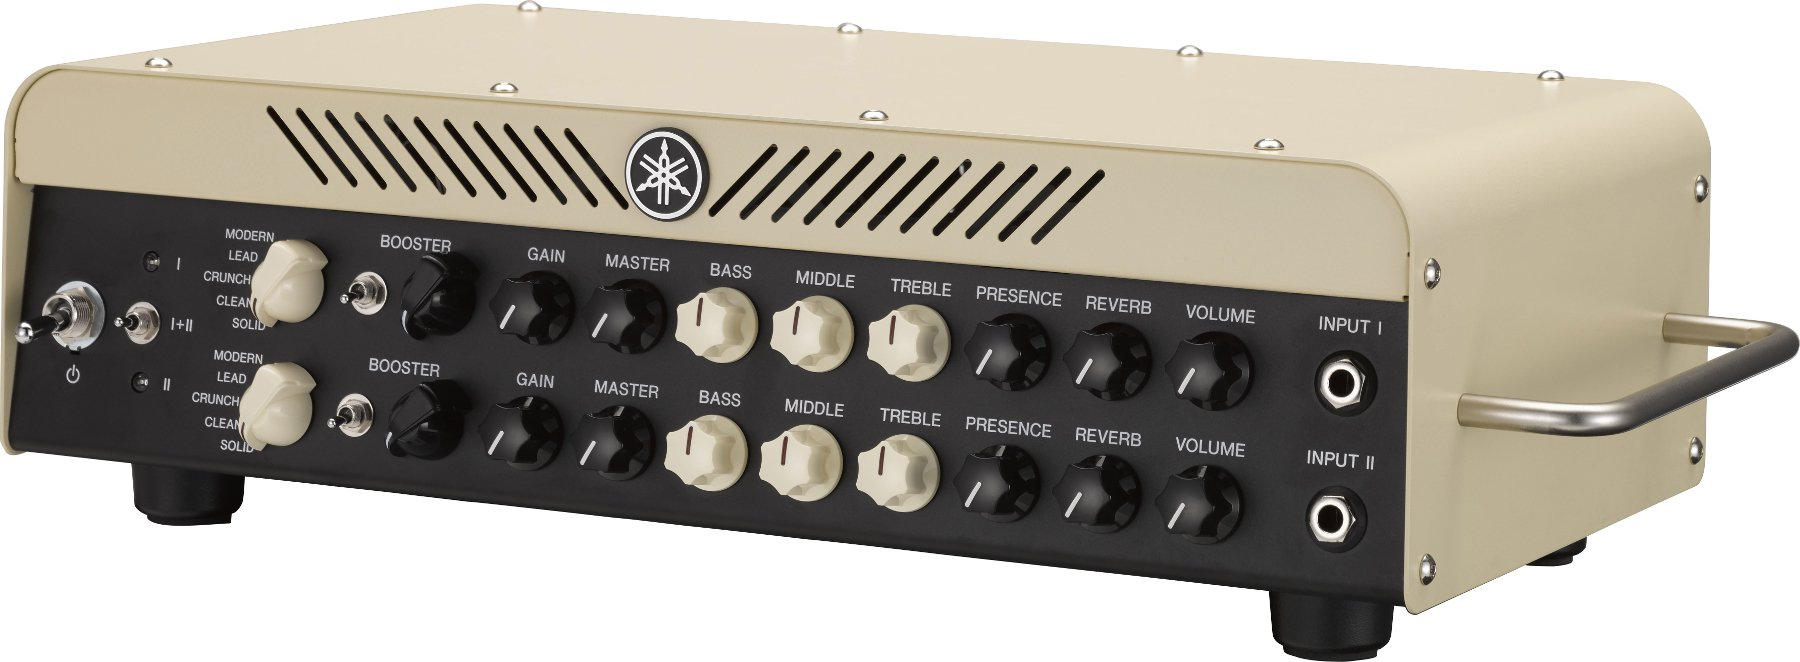 Dual-Channel Guitar Amp Head